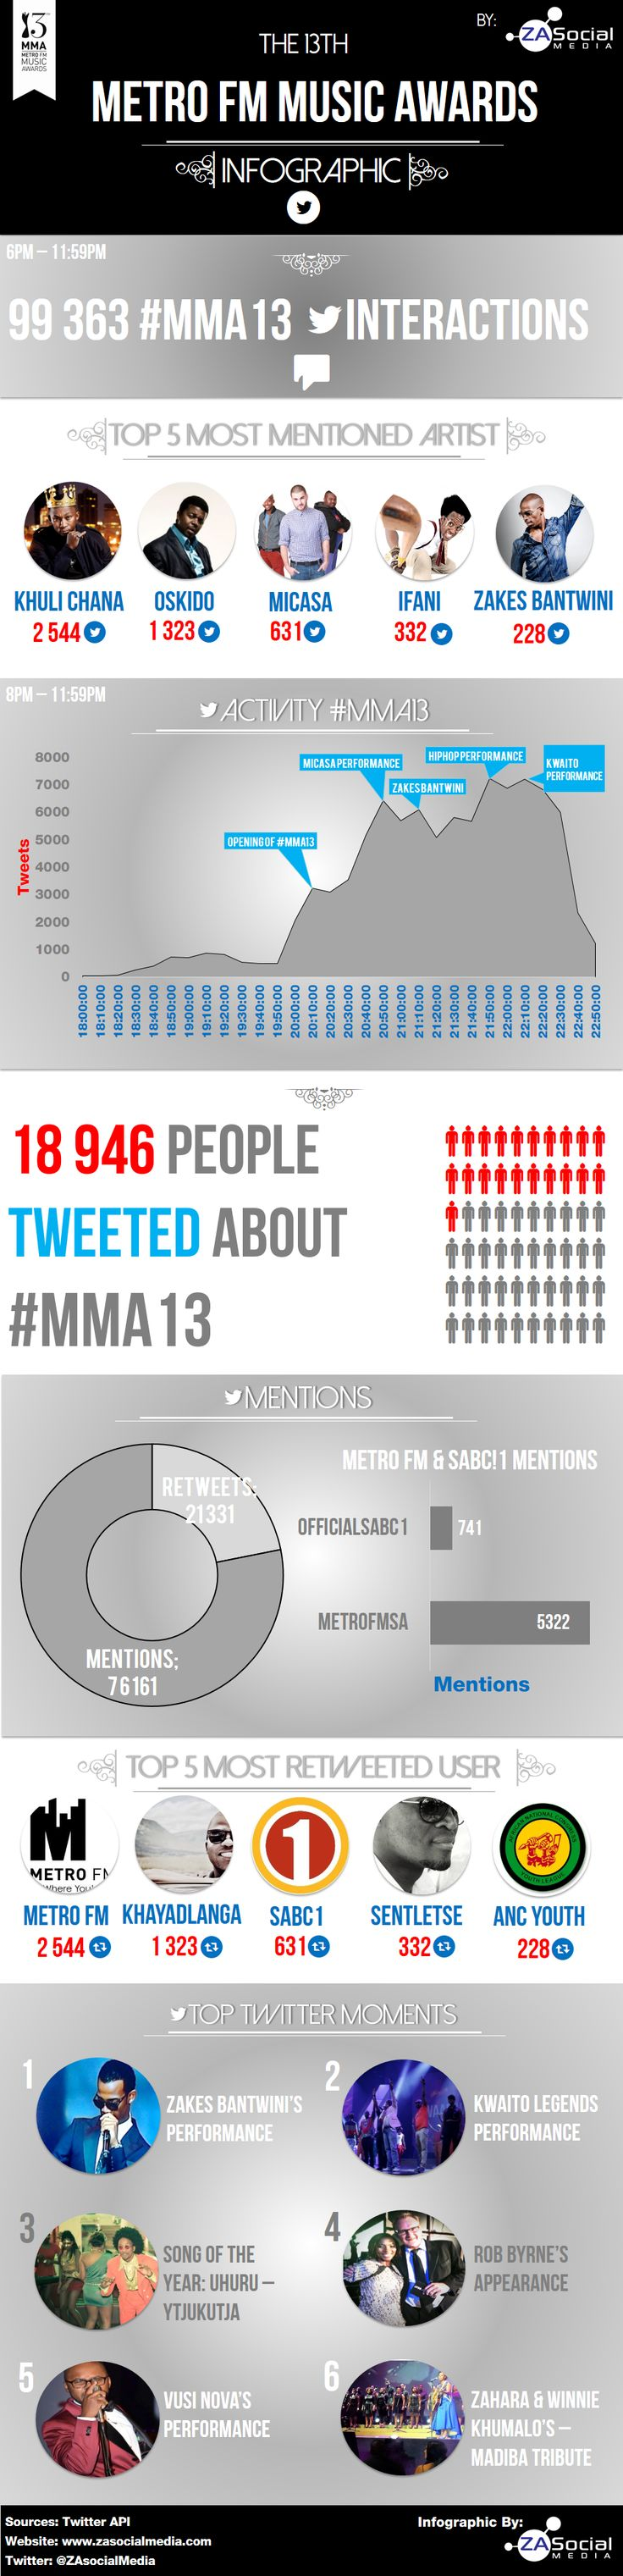 South African Metro FM Awards : Social Media Report